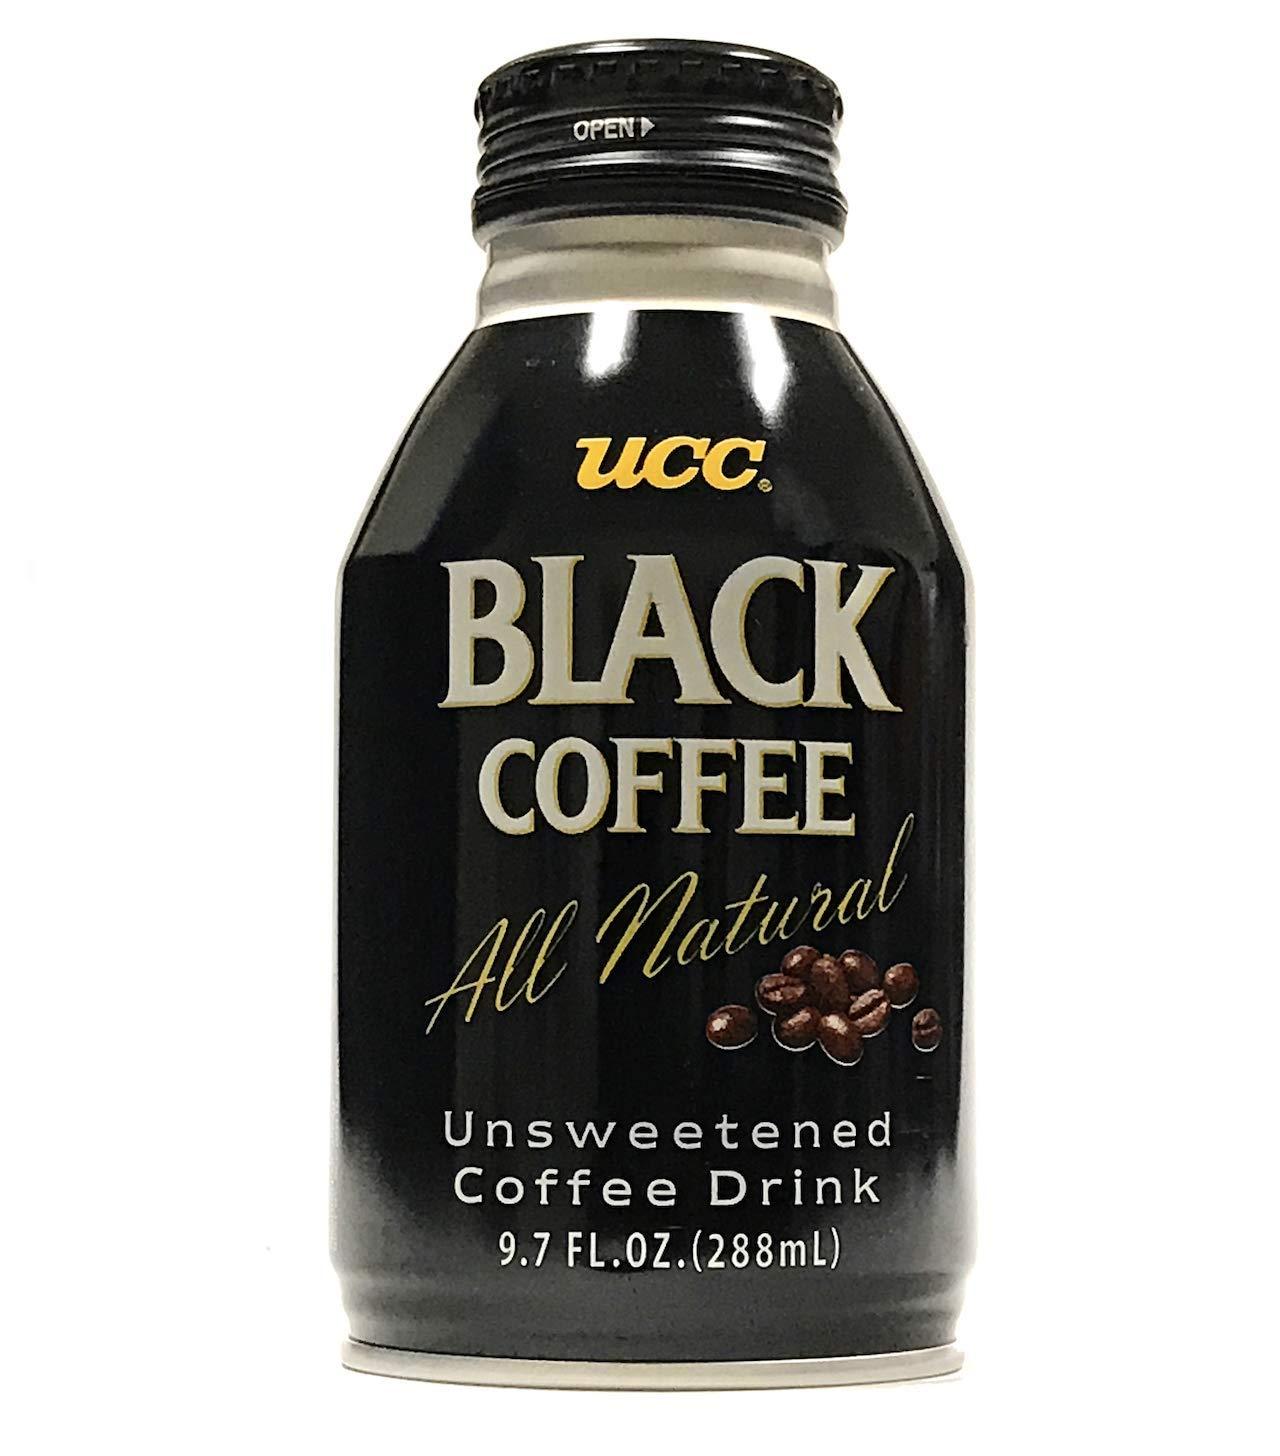 UCC Black Coffee, All Natural, Zero Sugar, Zero Calories - 9.73 Fl Oz | Pack of 24 by C&U